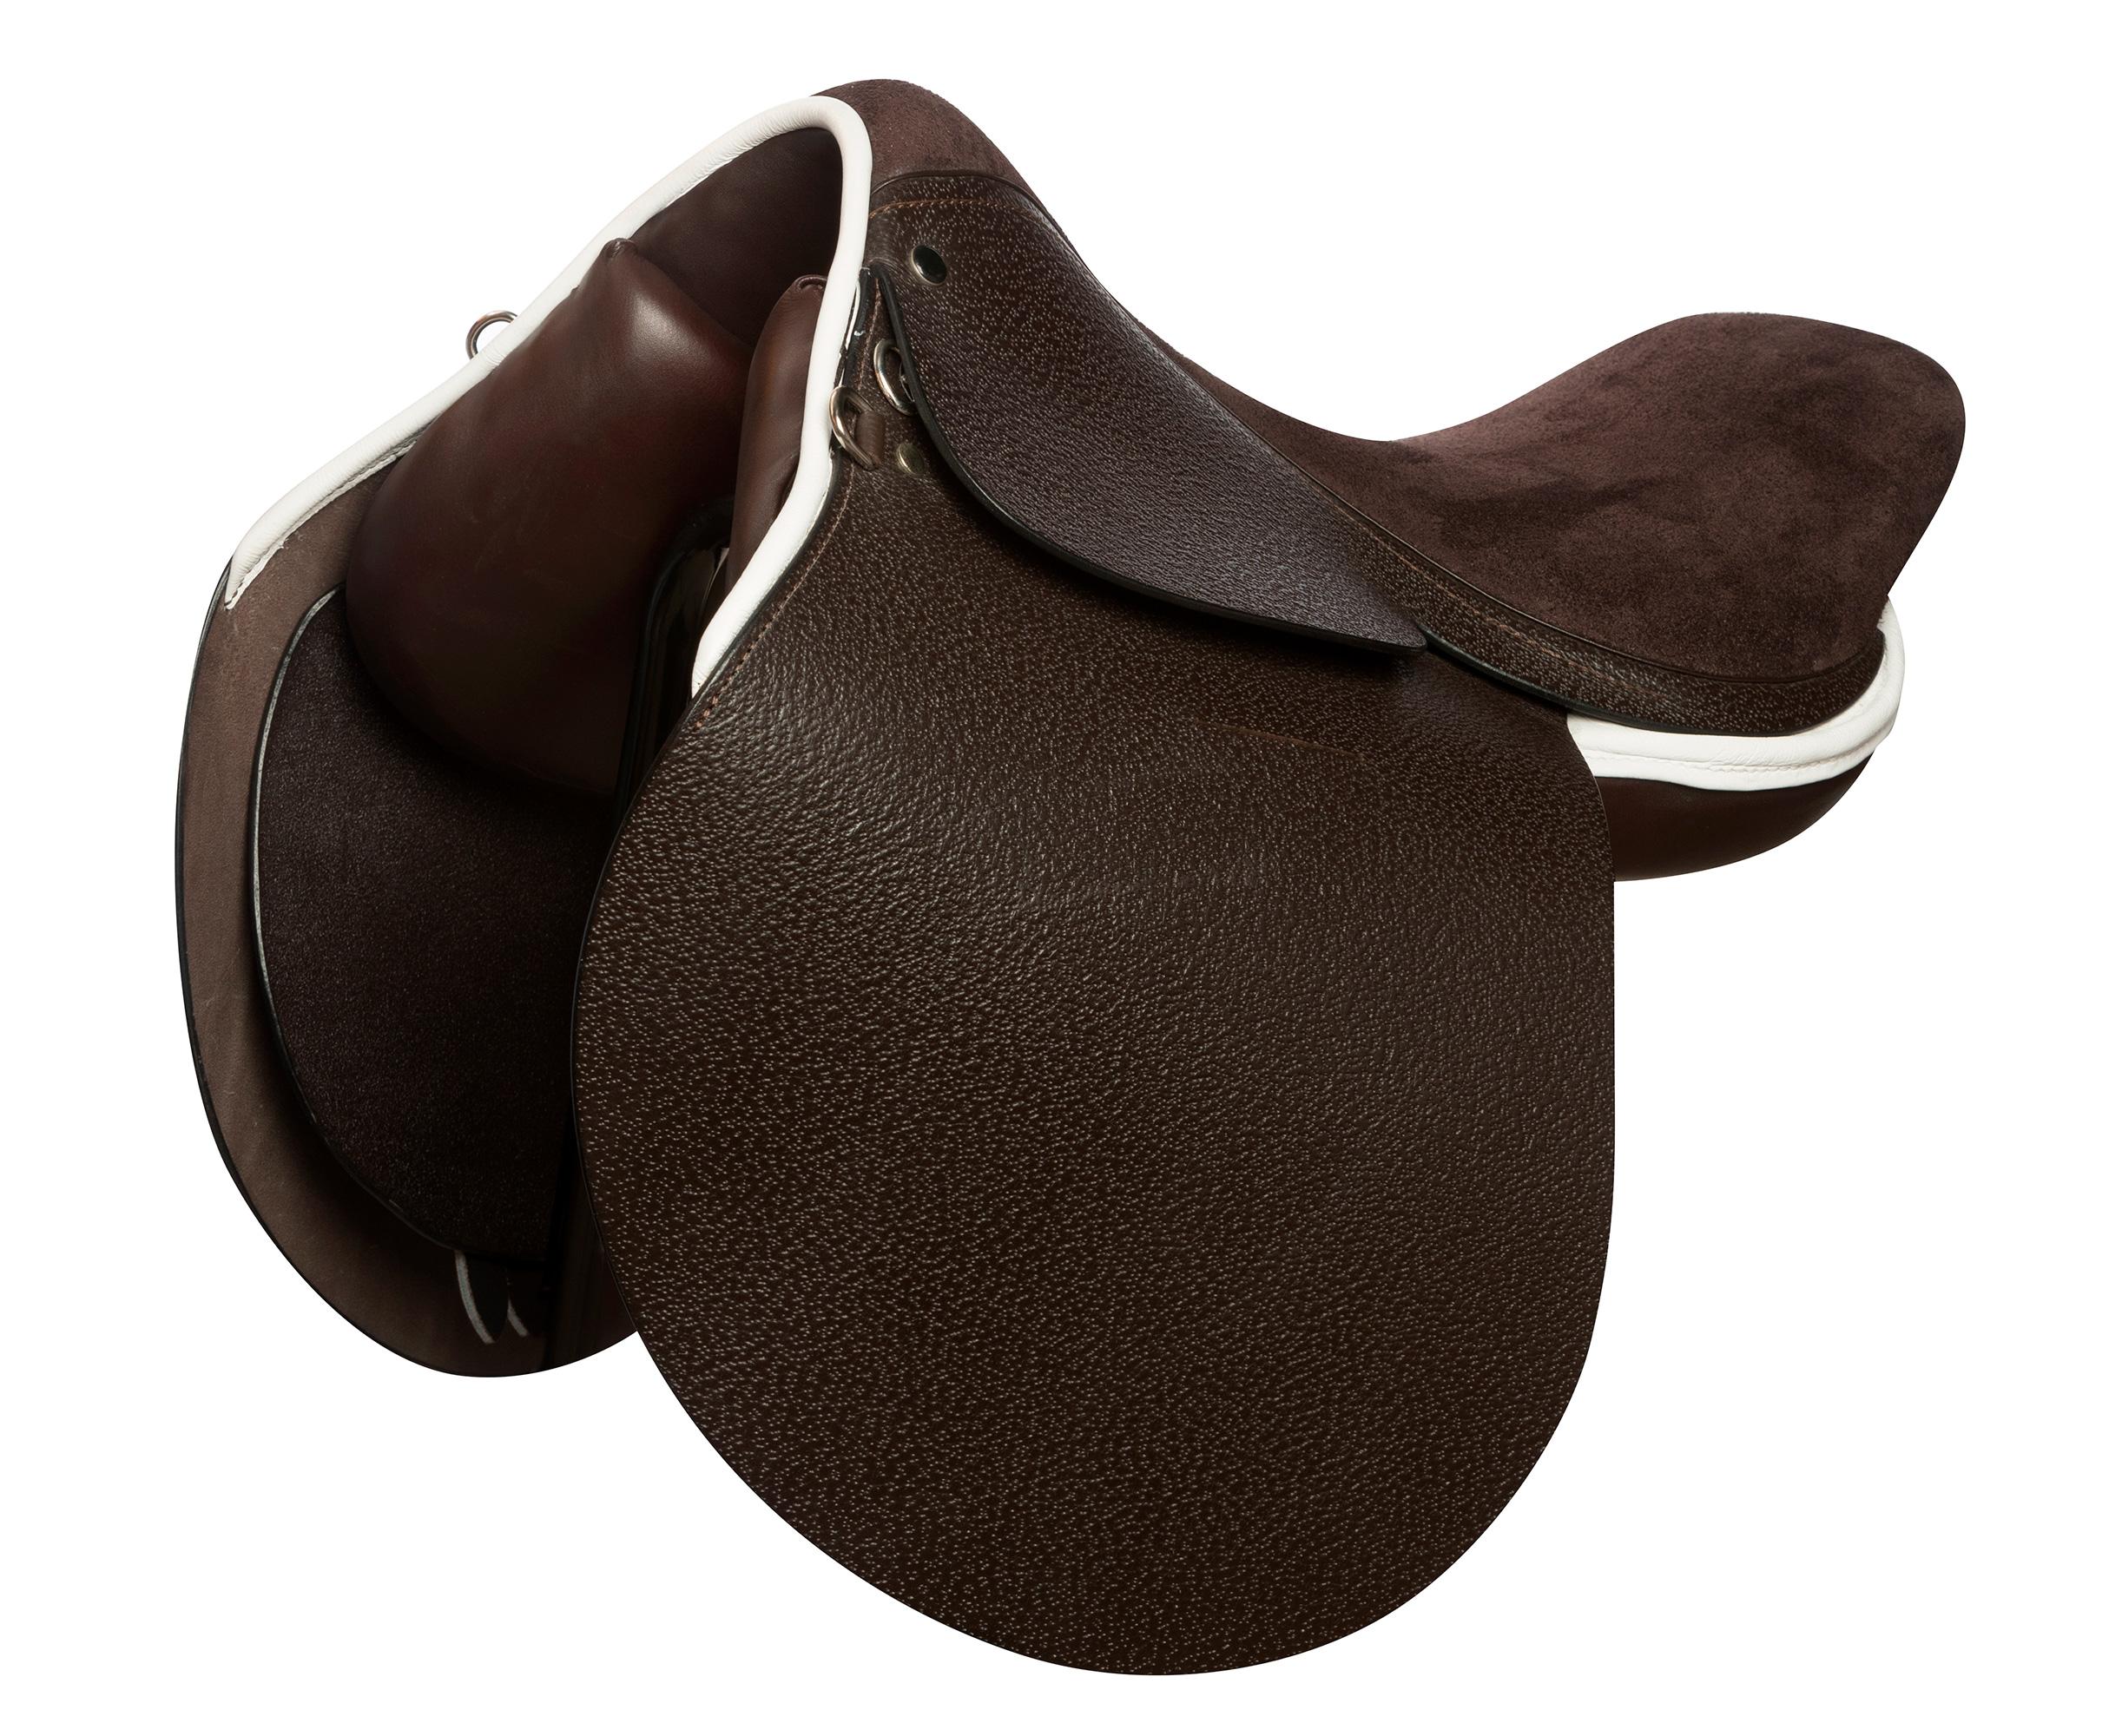 Gonzalito Polo Saddle